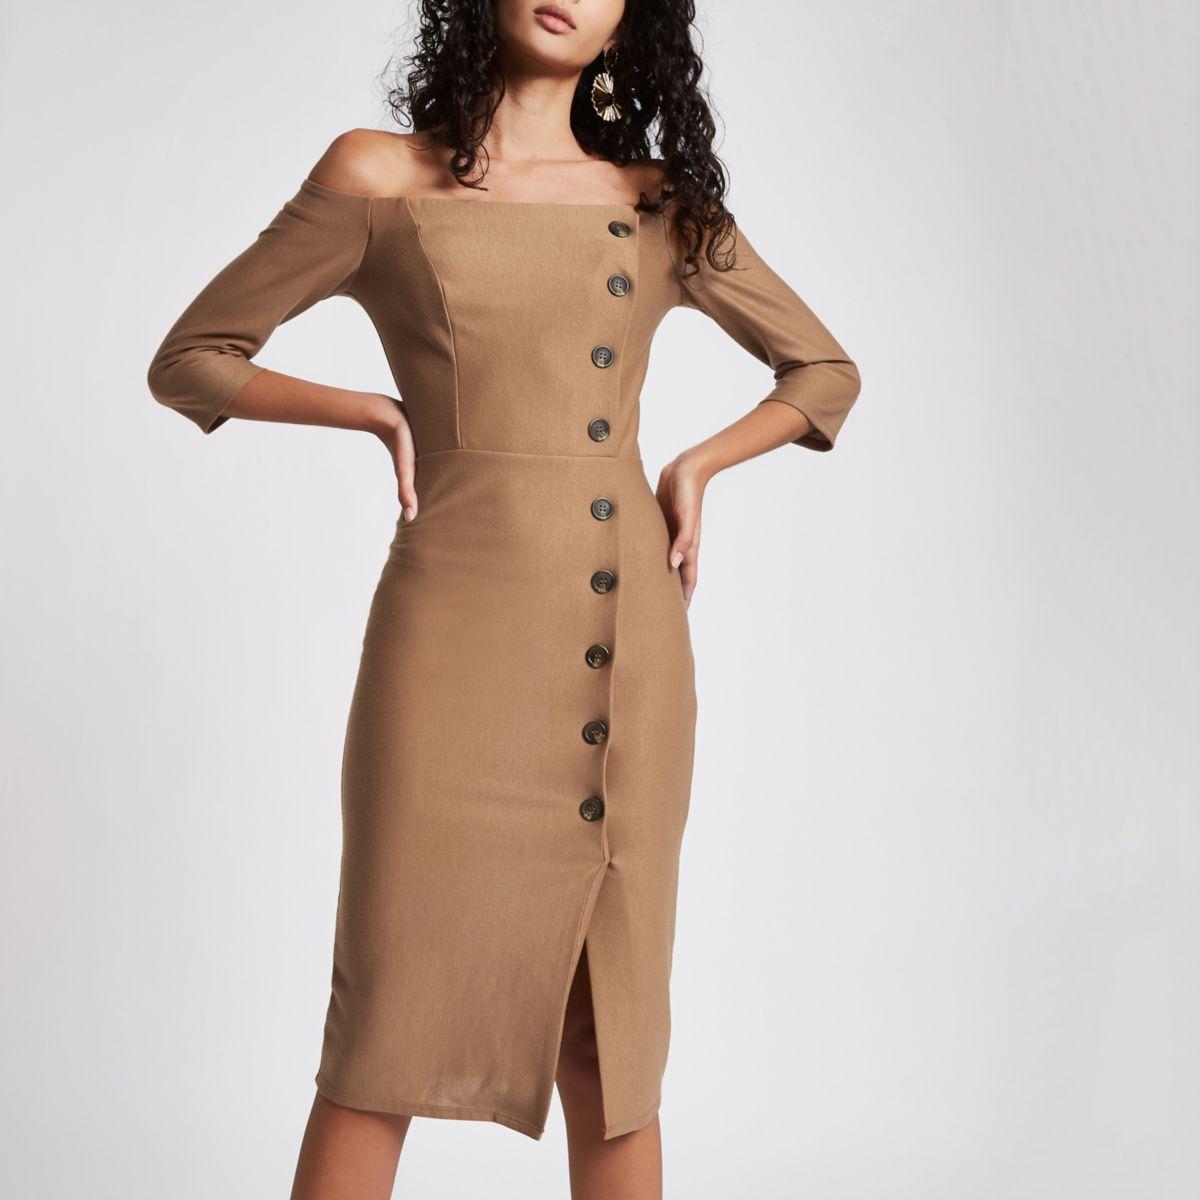 Beige bardot button front bodycon midi dress